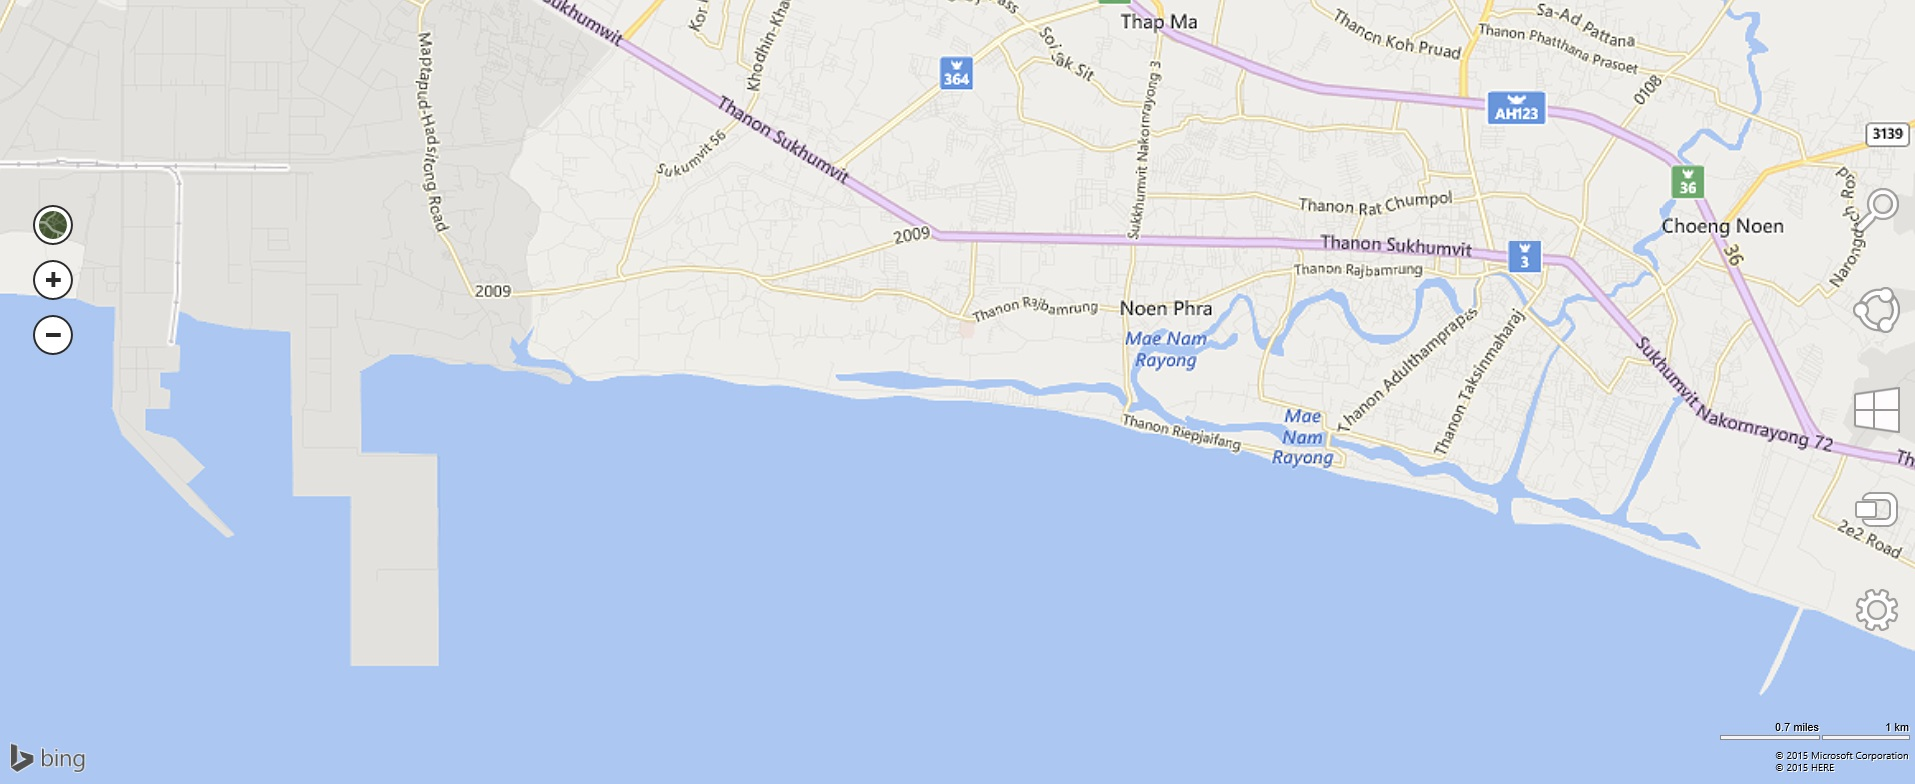 Coast of Mapta Phut Rayong Province of Thailand Revolution myself